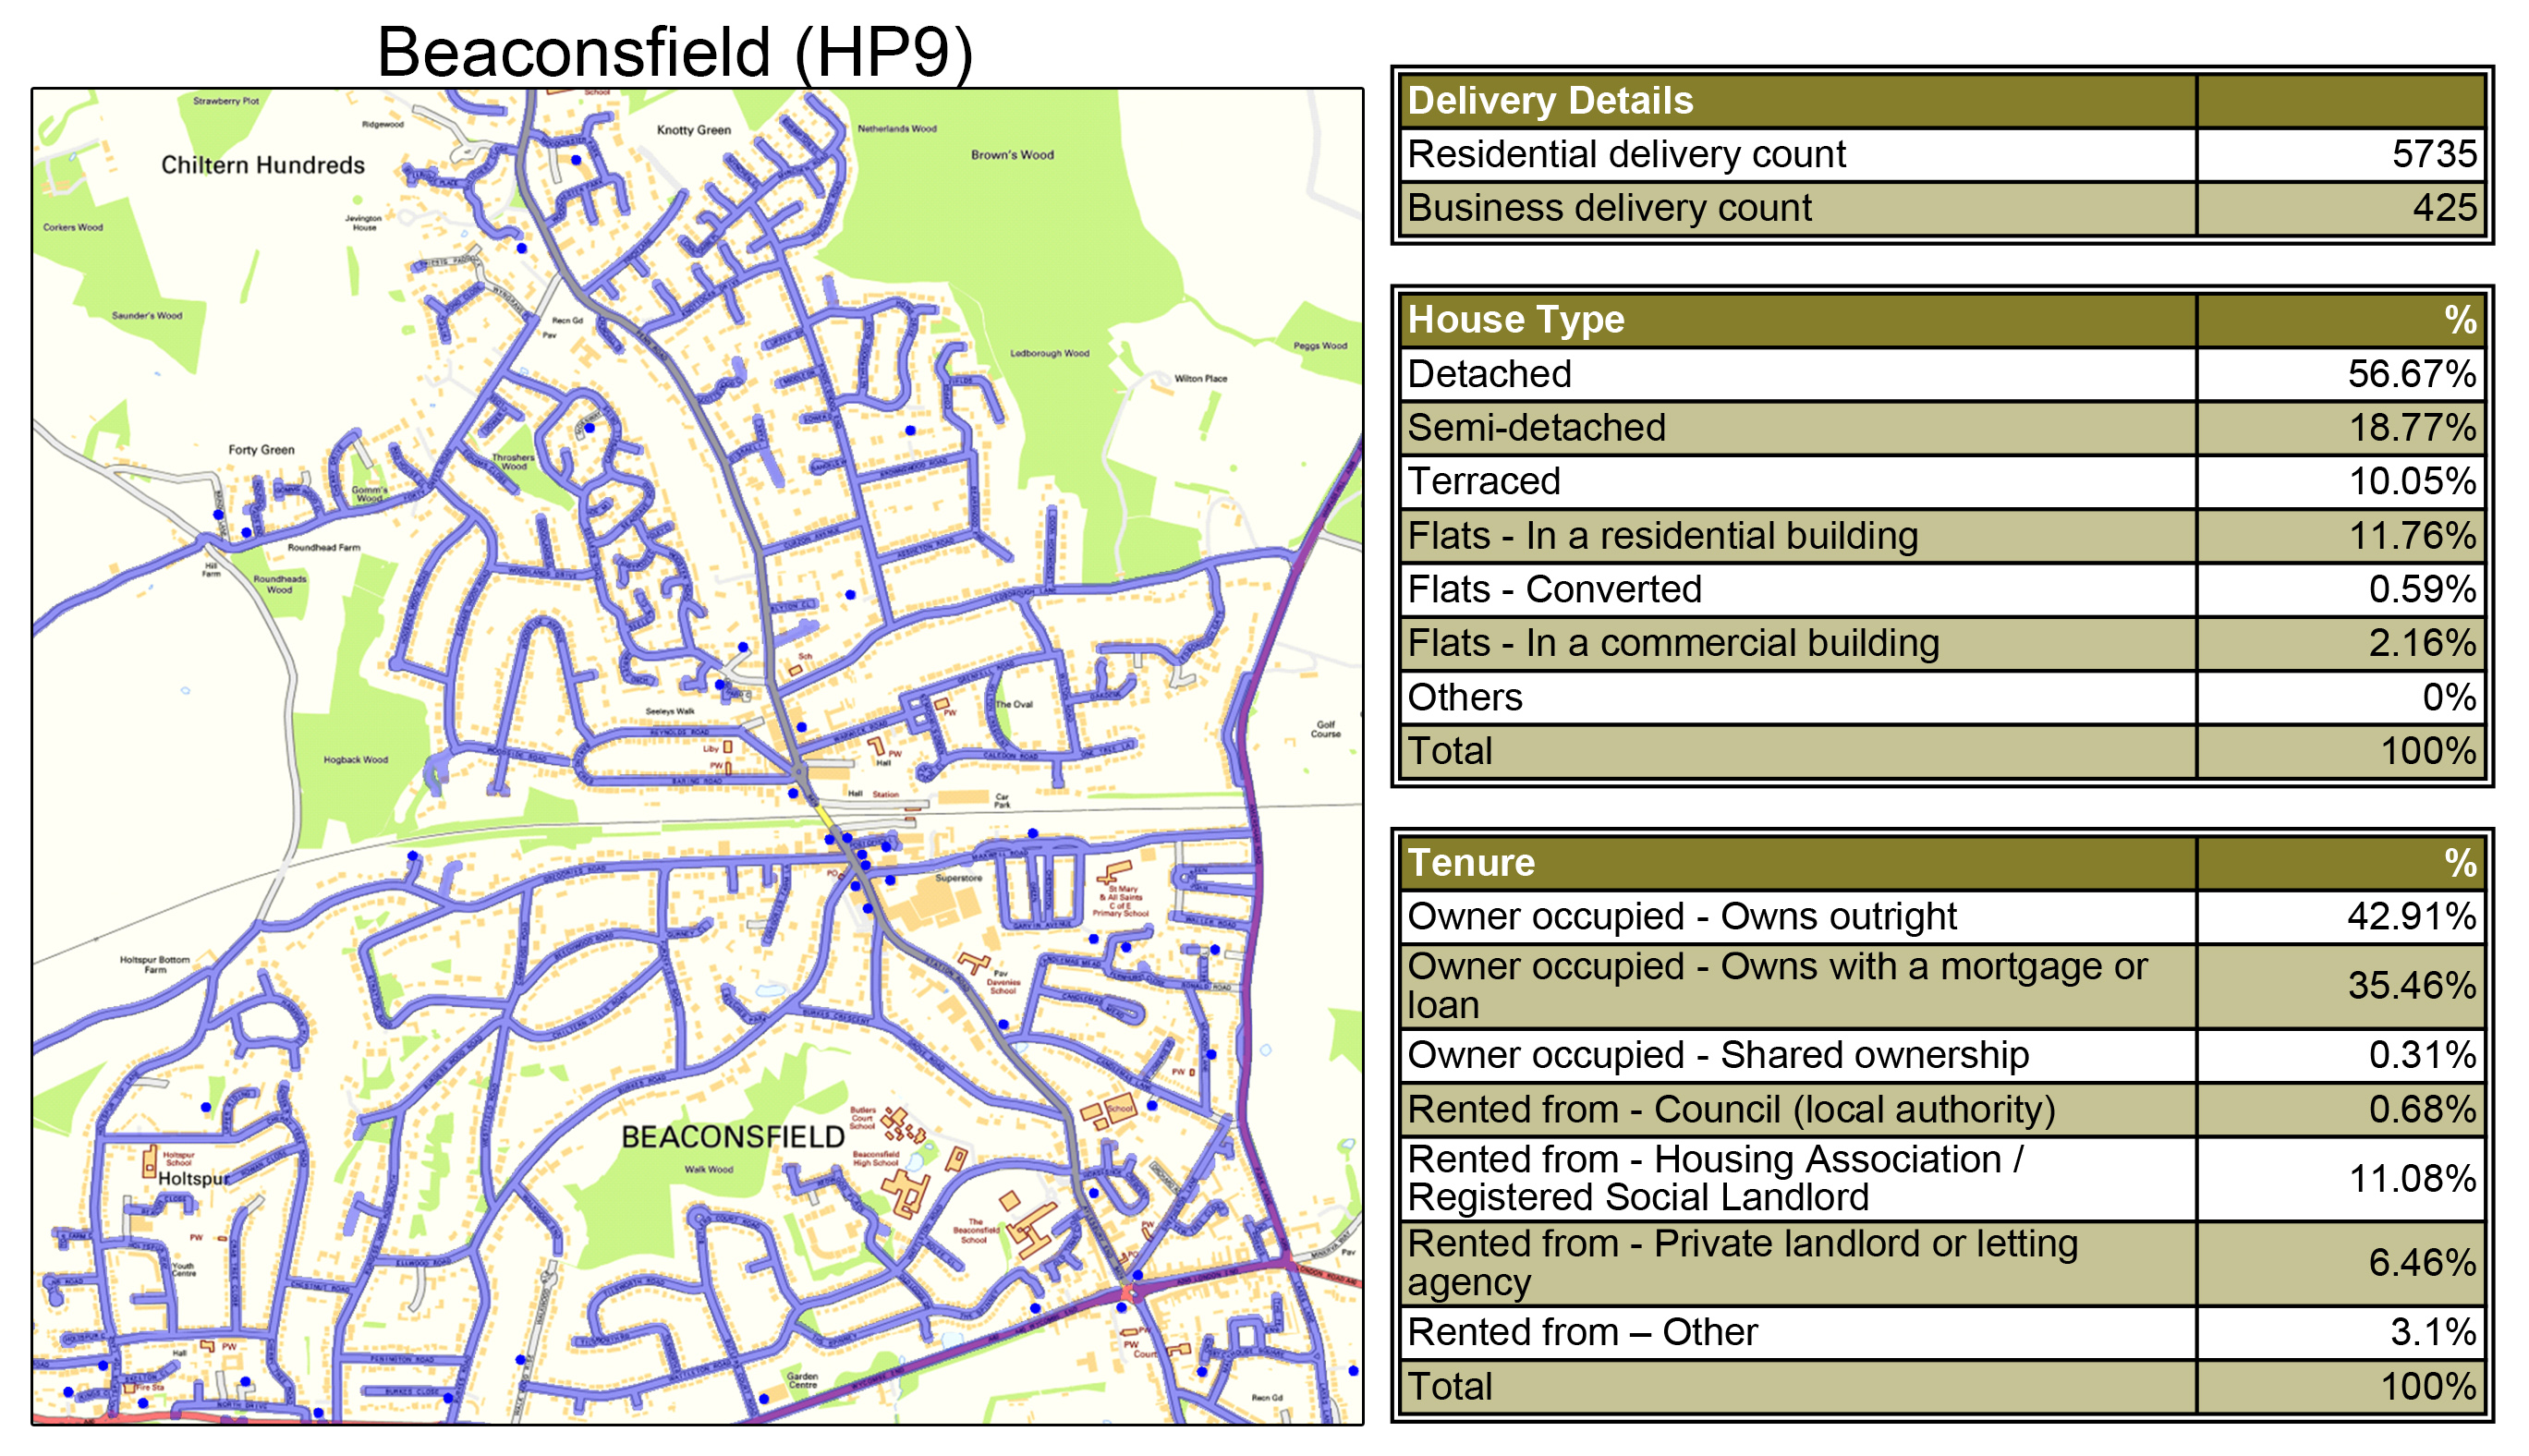 Leaflet Distribution Beaconsfield - Geoplan Image